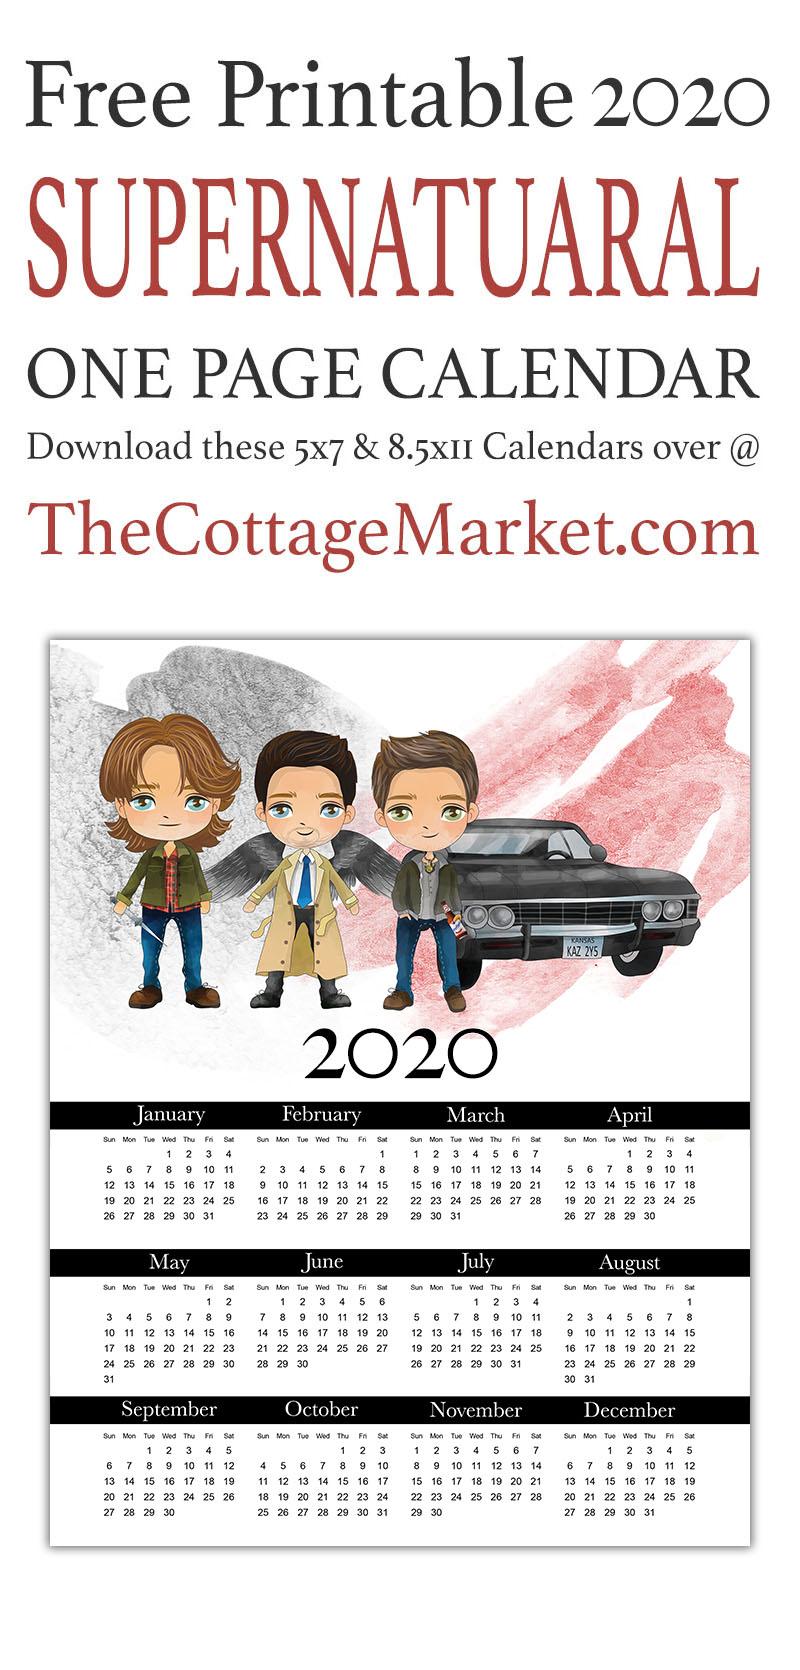 https://thecottagemarket.com/wp-content/uploads/2019/11/TCM-Supernatural-OnePage-2020-Calendar-t-1.jpg